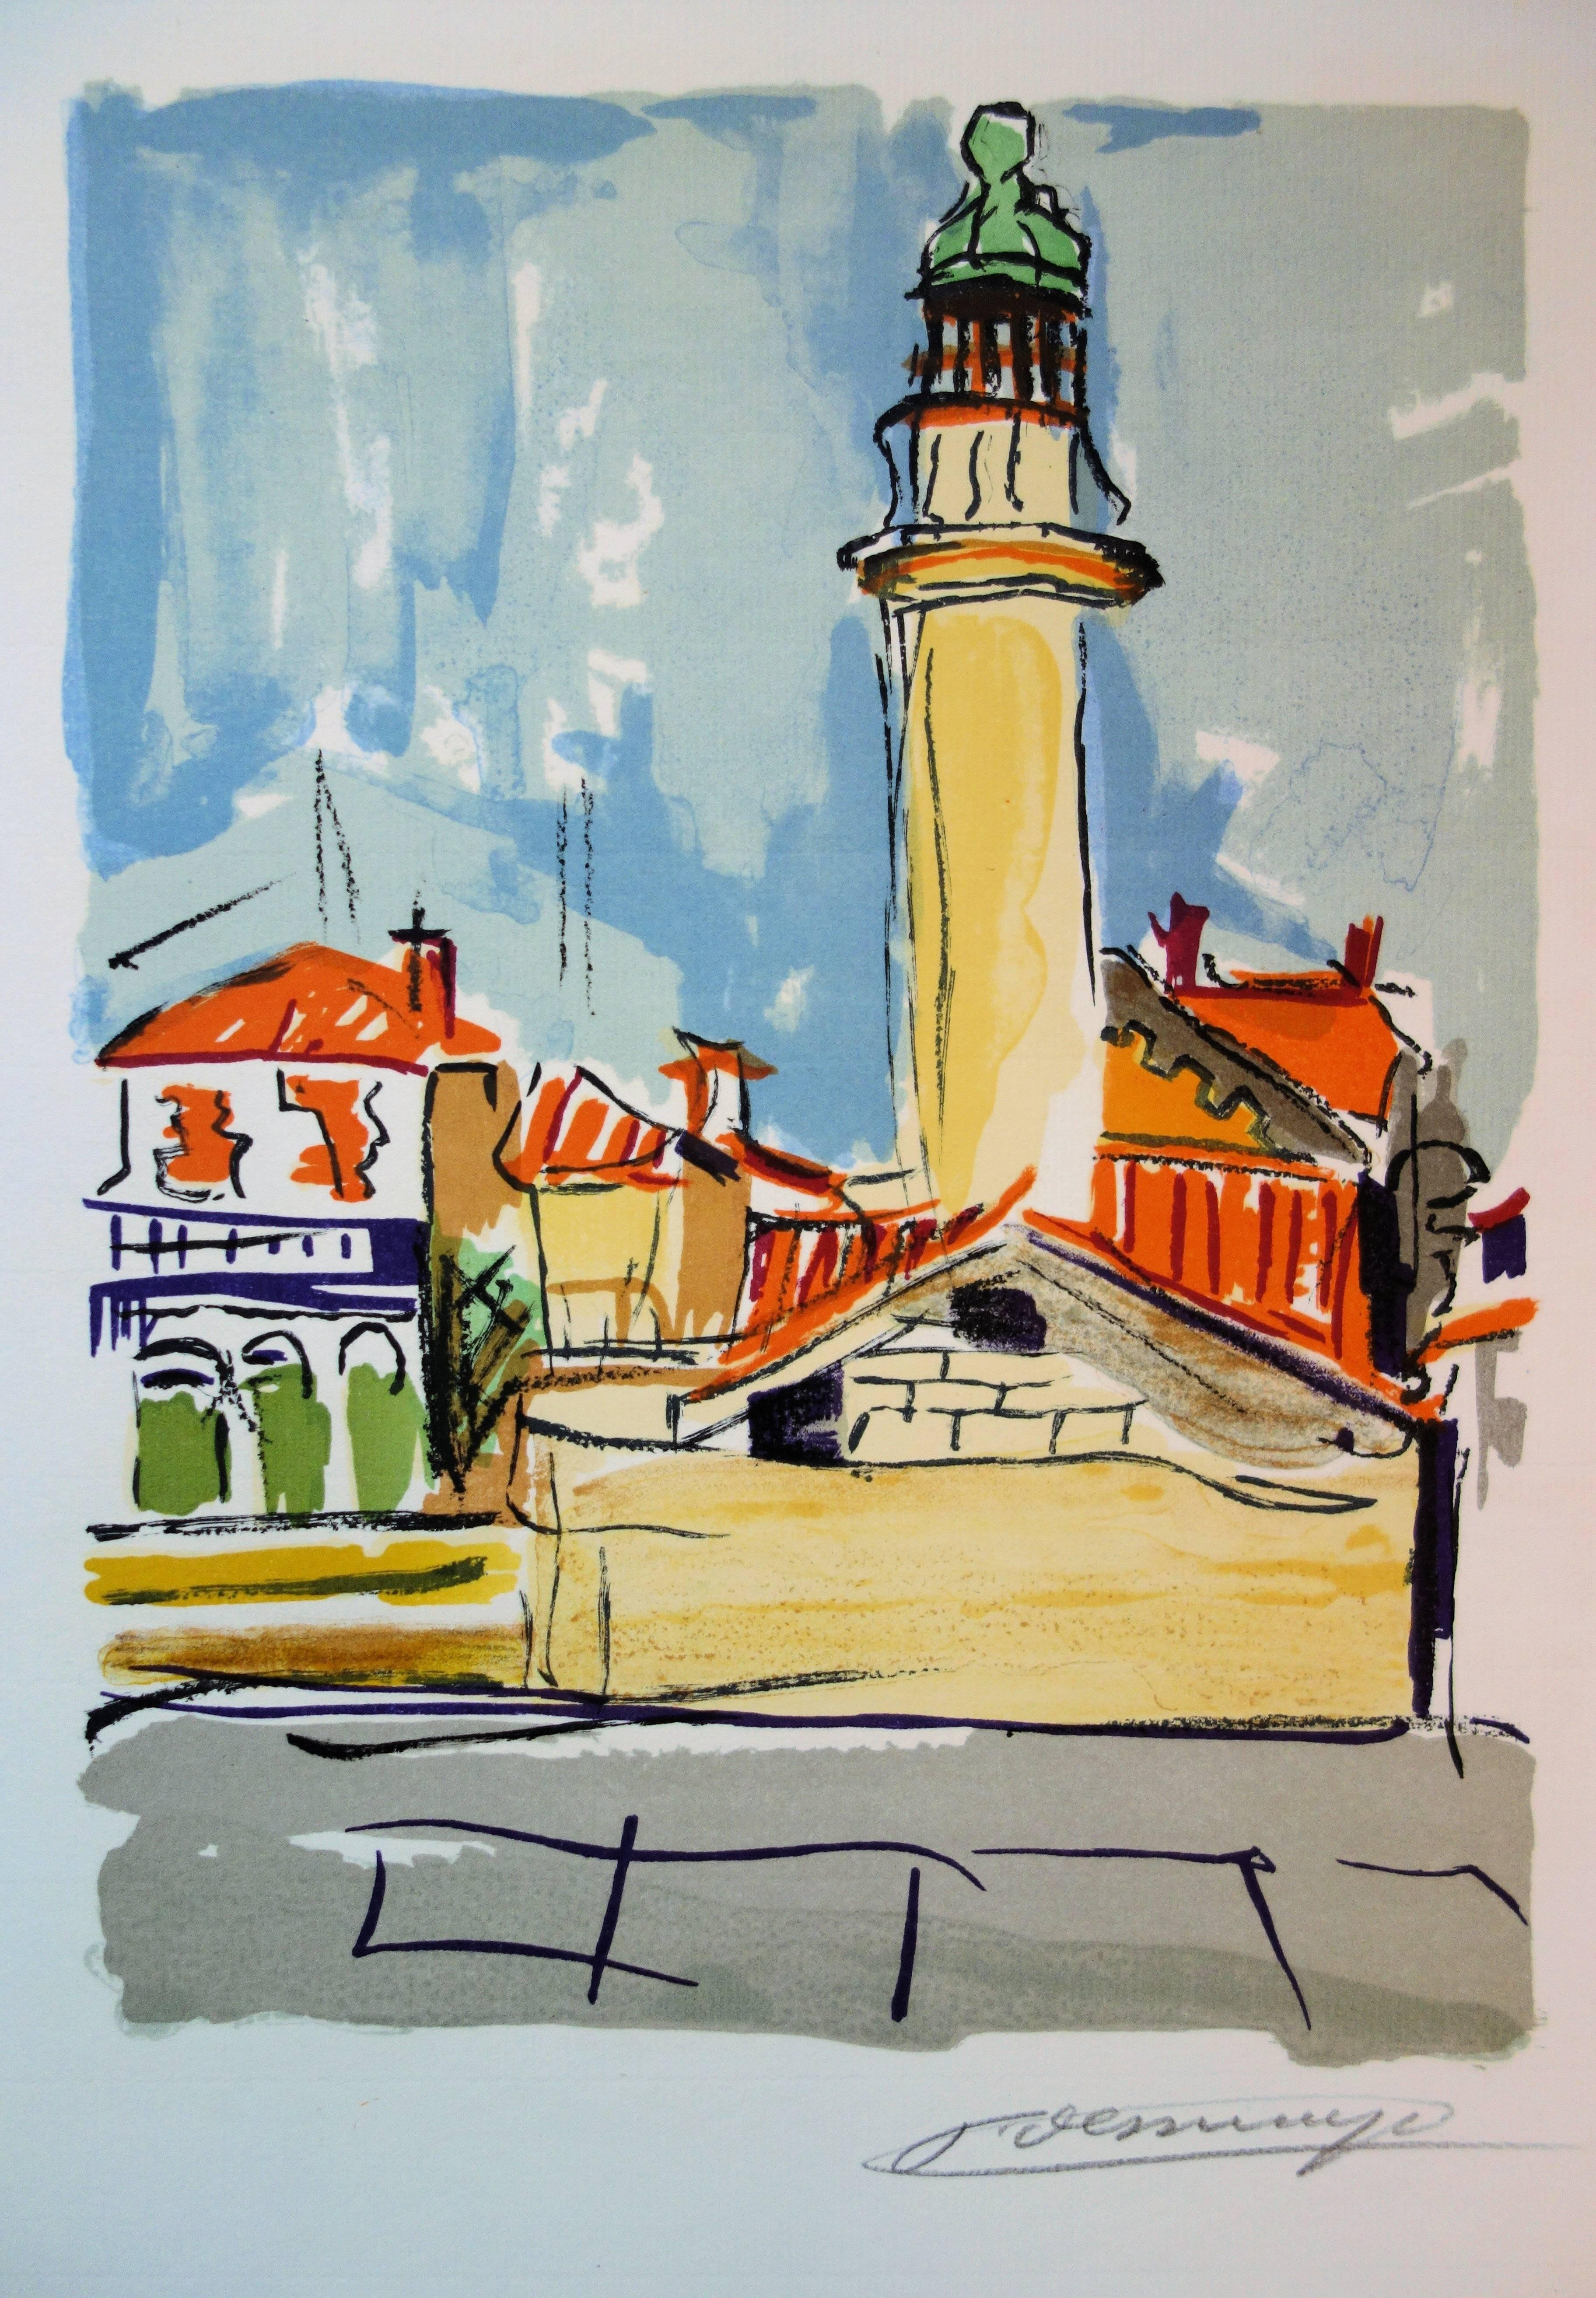 The Lighthouse - Original handsigned lithograph